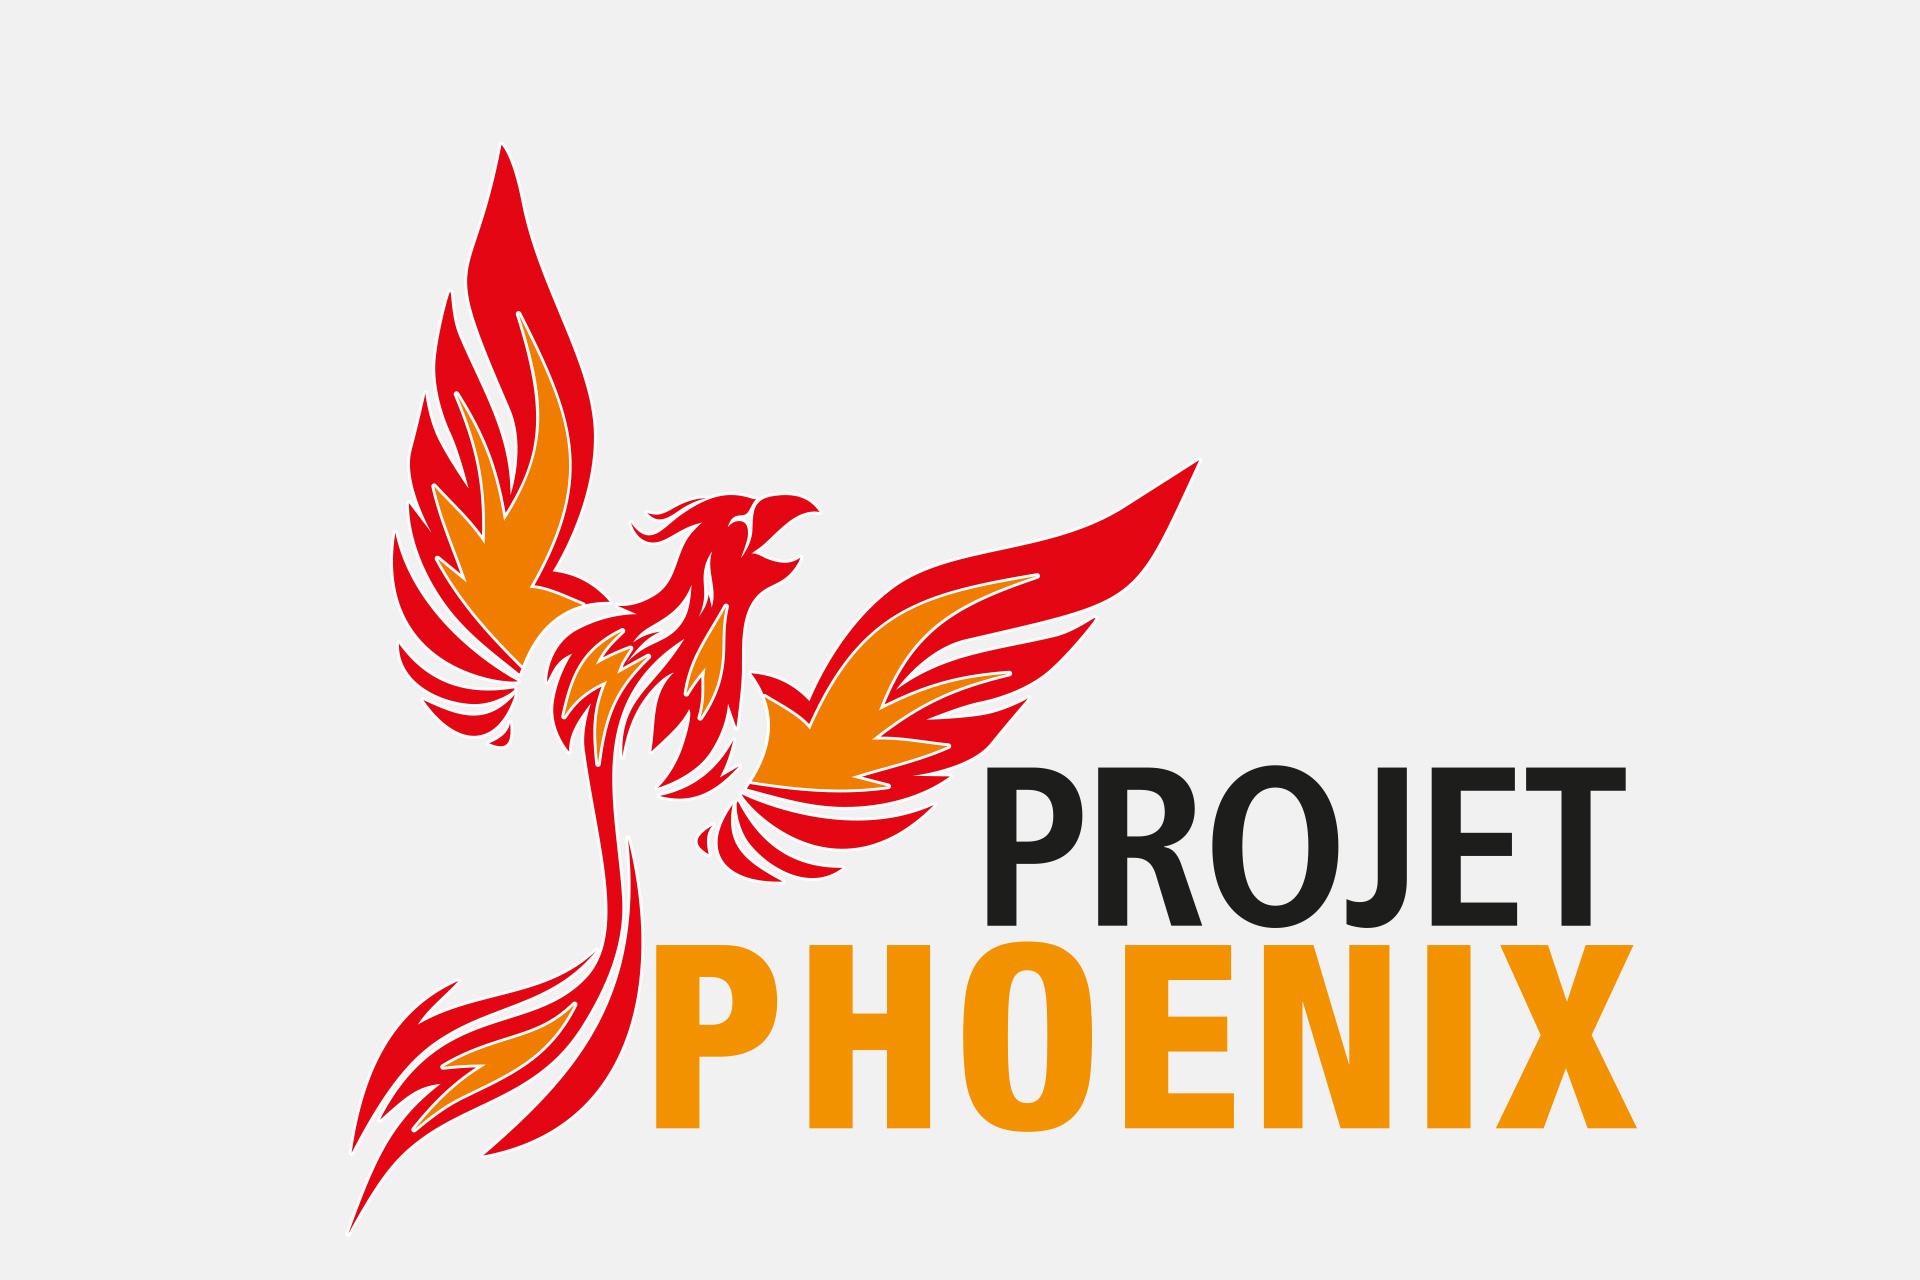 Projet PHEONIX